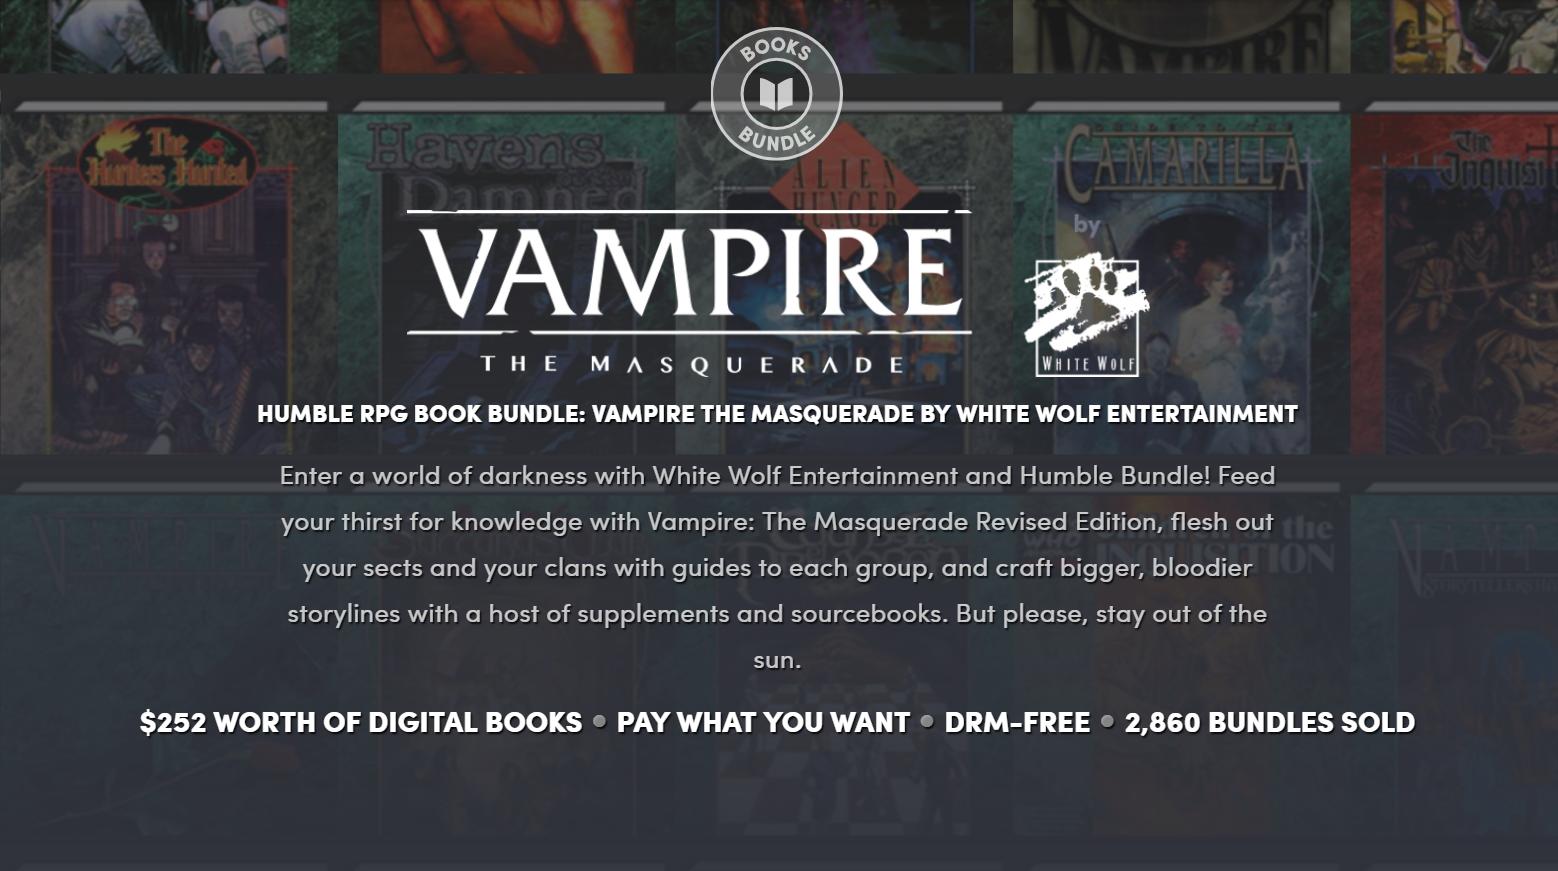 Vampire: The Masquerade humble bundle